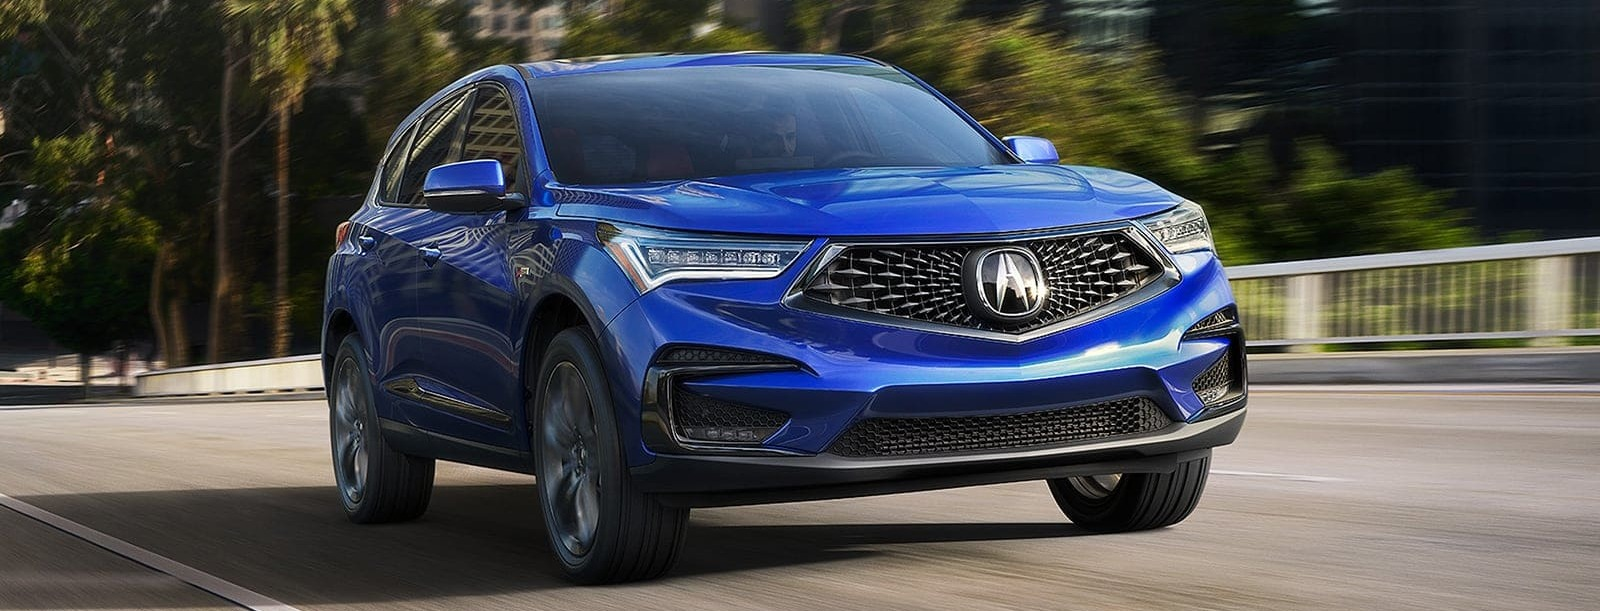 2020 Acura RDX for Sale near Palatine, IL